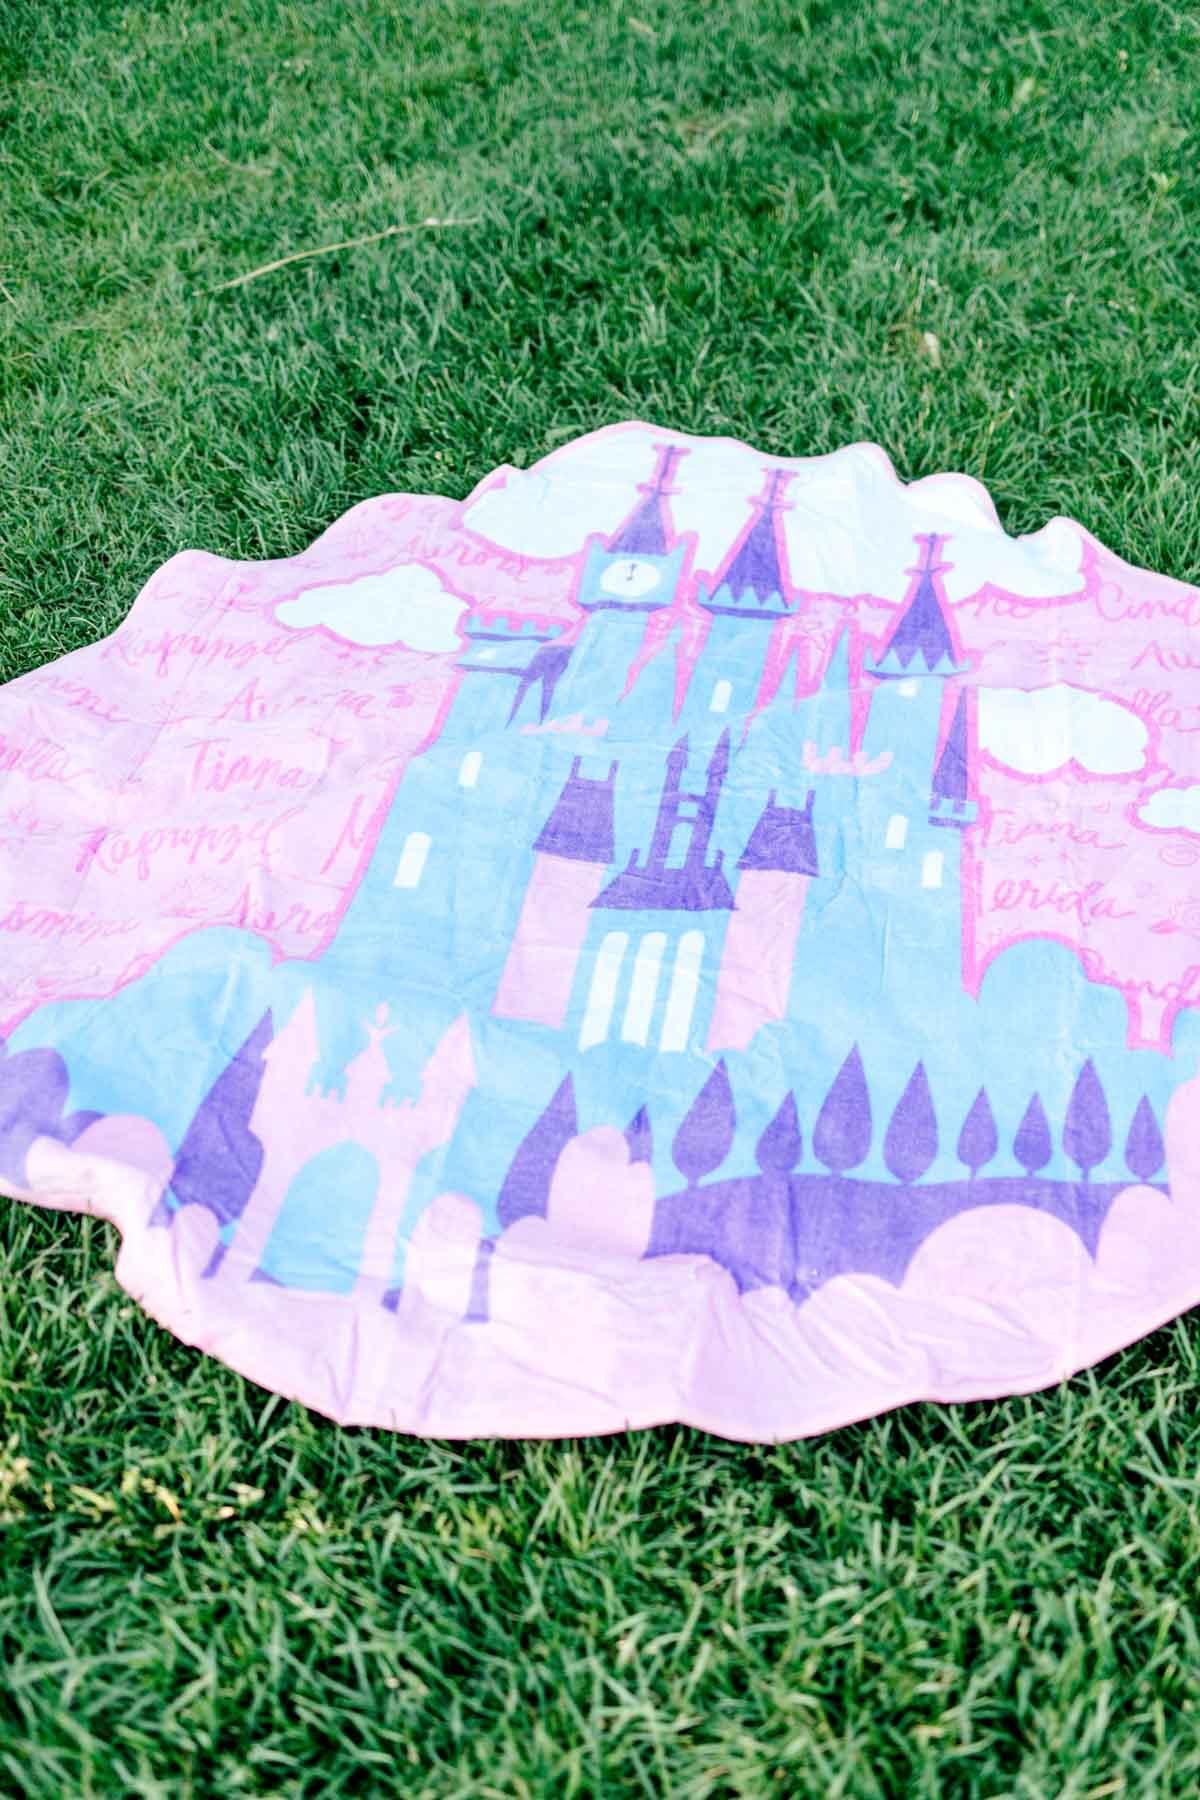 princess beach towel on grass